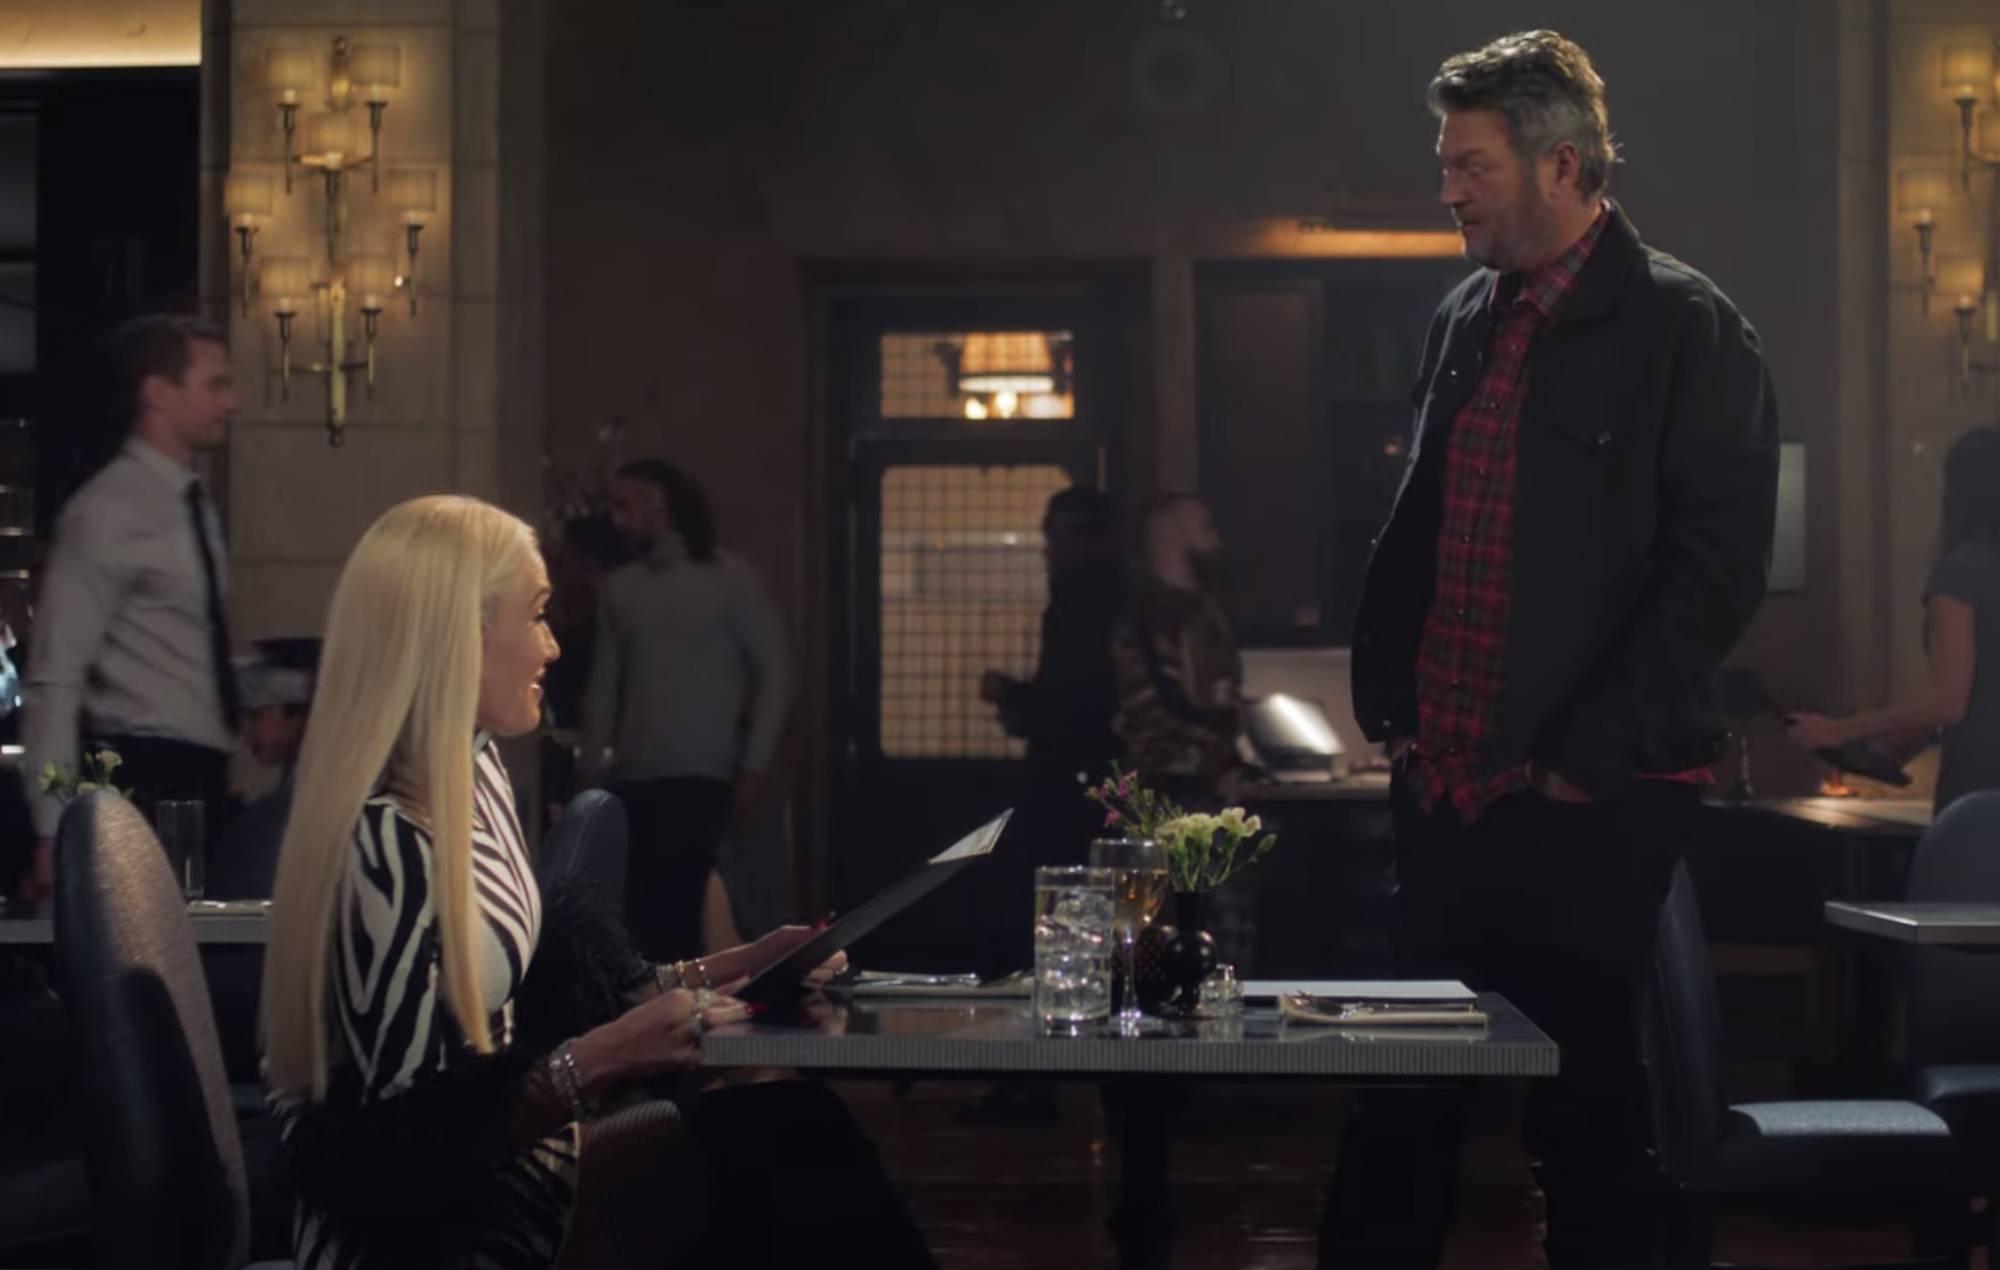 Watch Gwen Stefani and Blake Shelton's romantic Super Bowl commercial